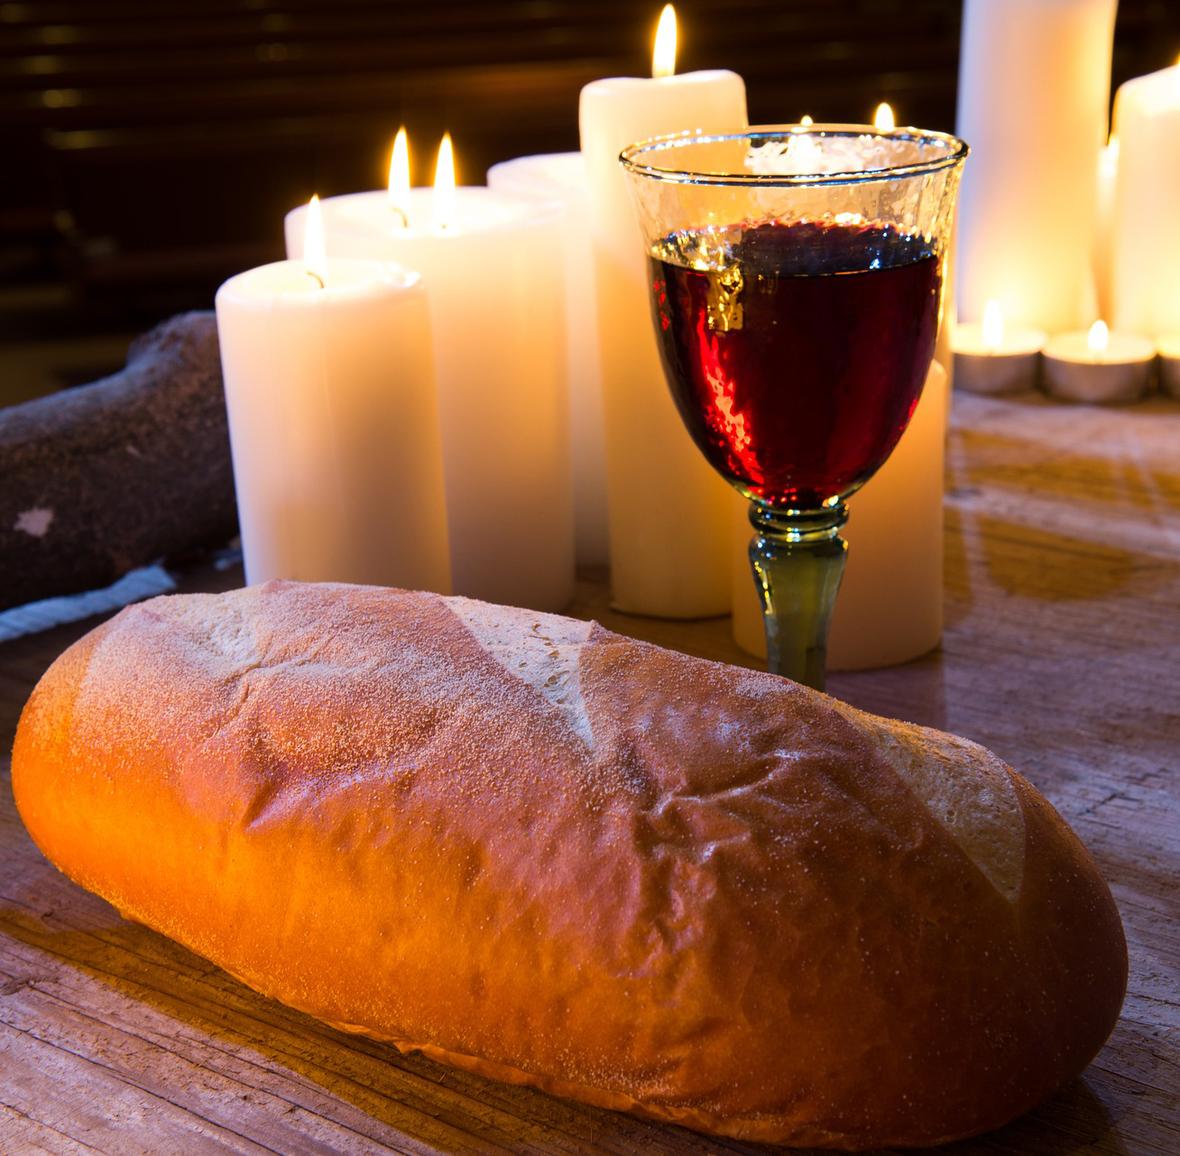 communion-1997305 1920